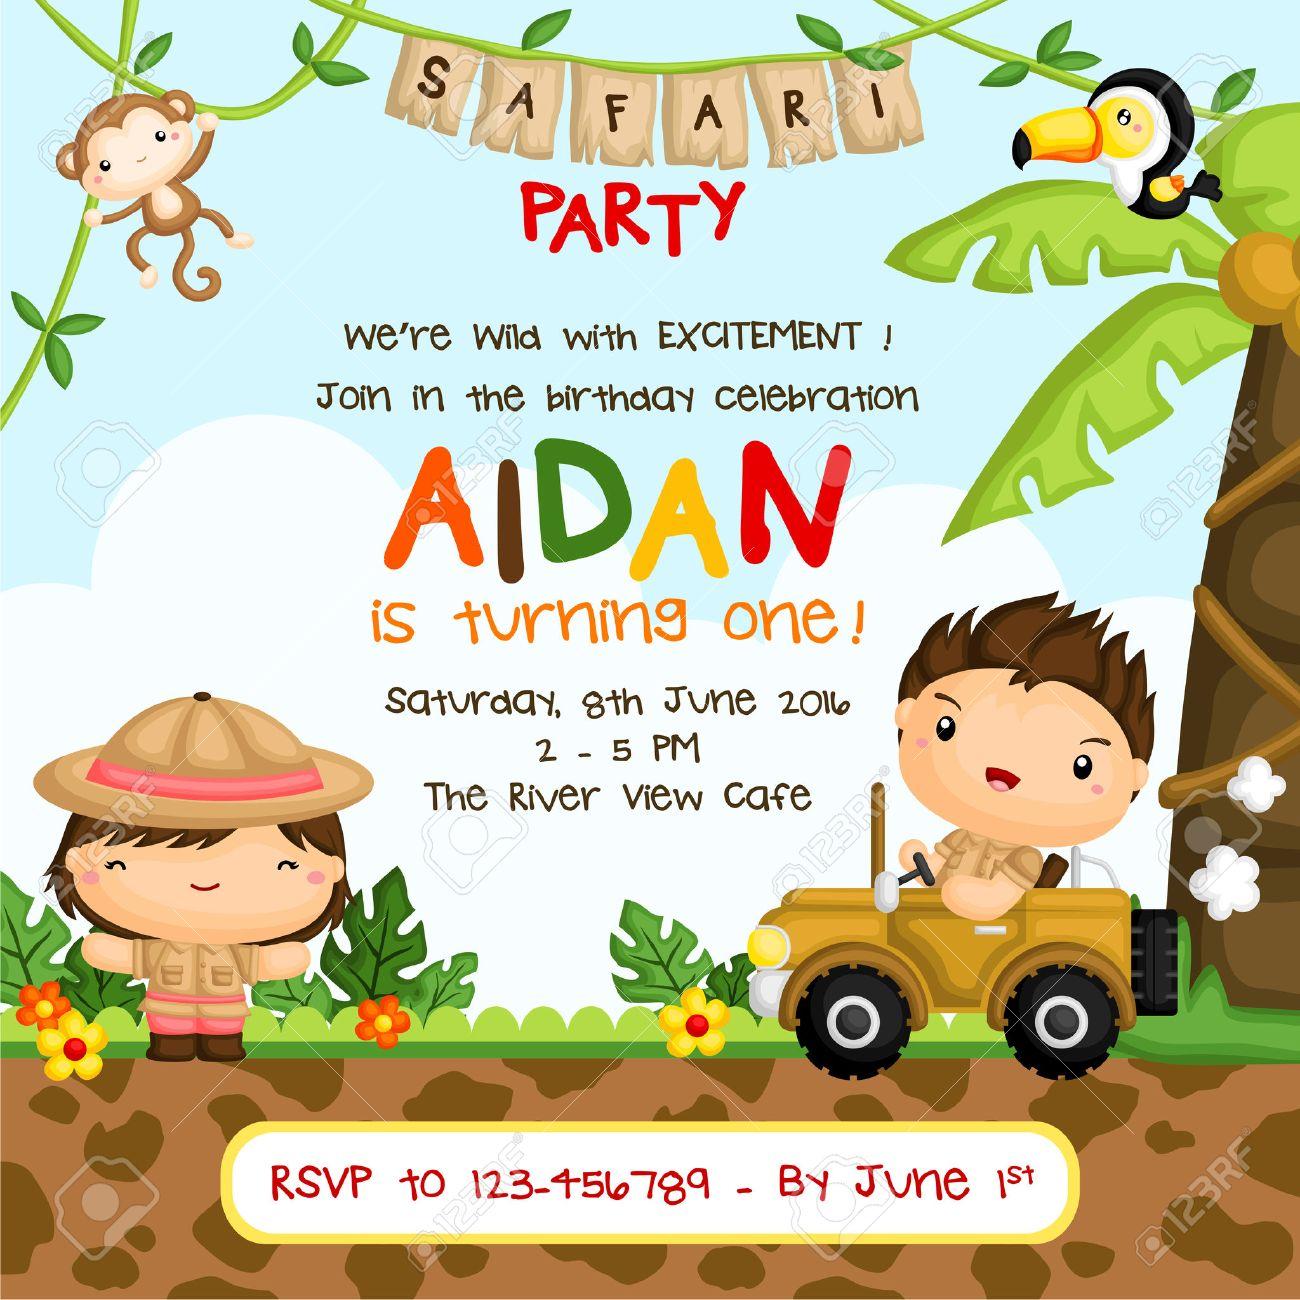 kids invitation - Etame.mibawa.co